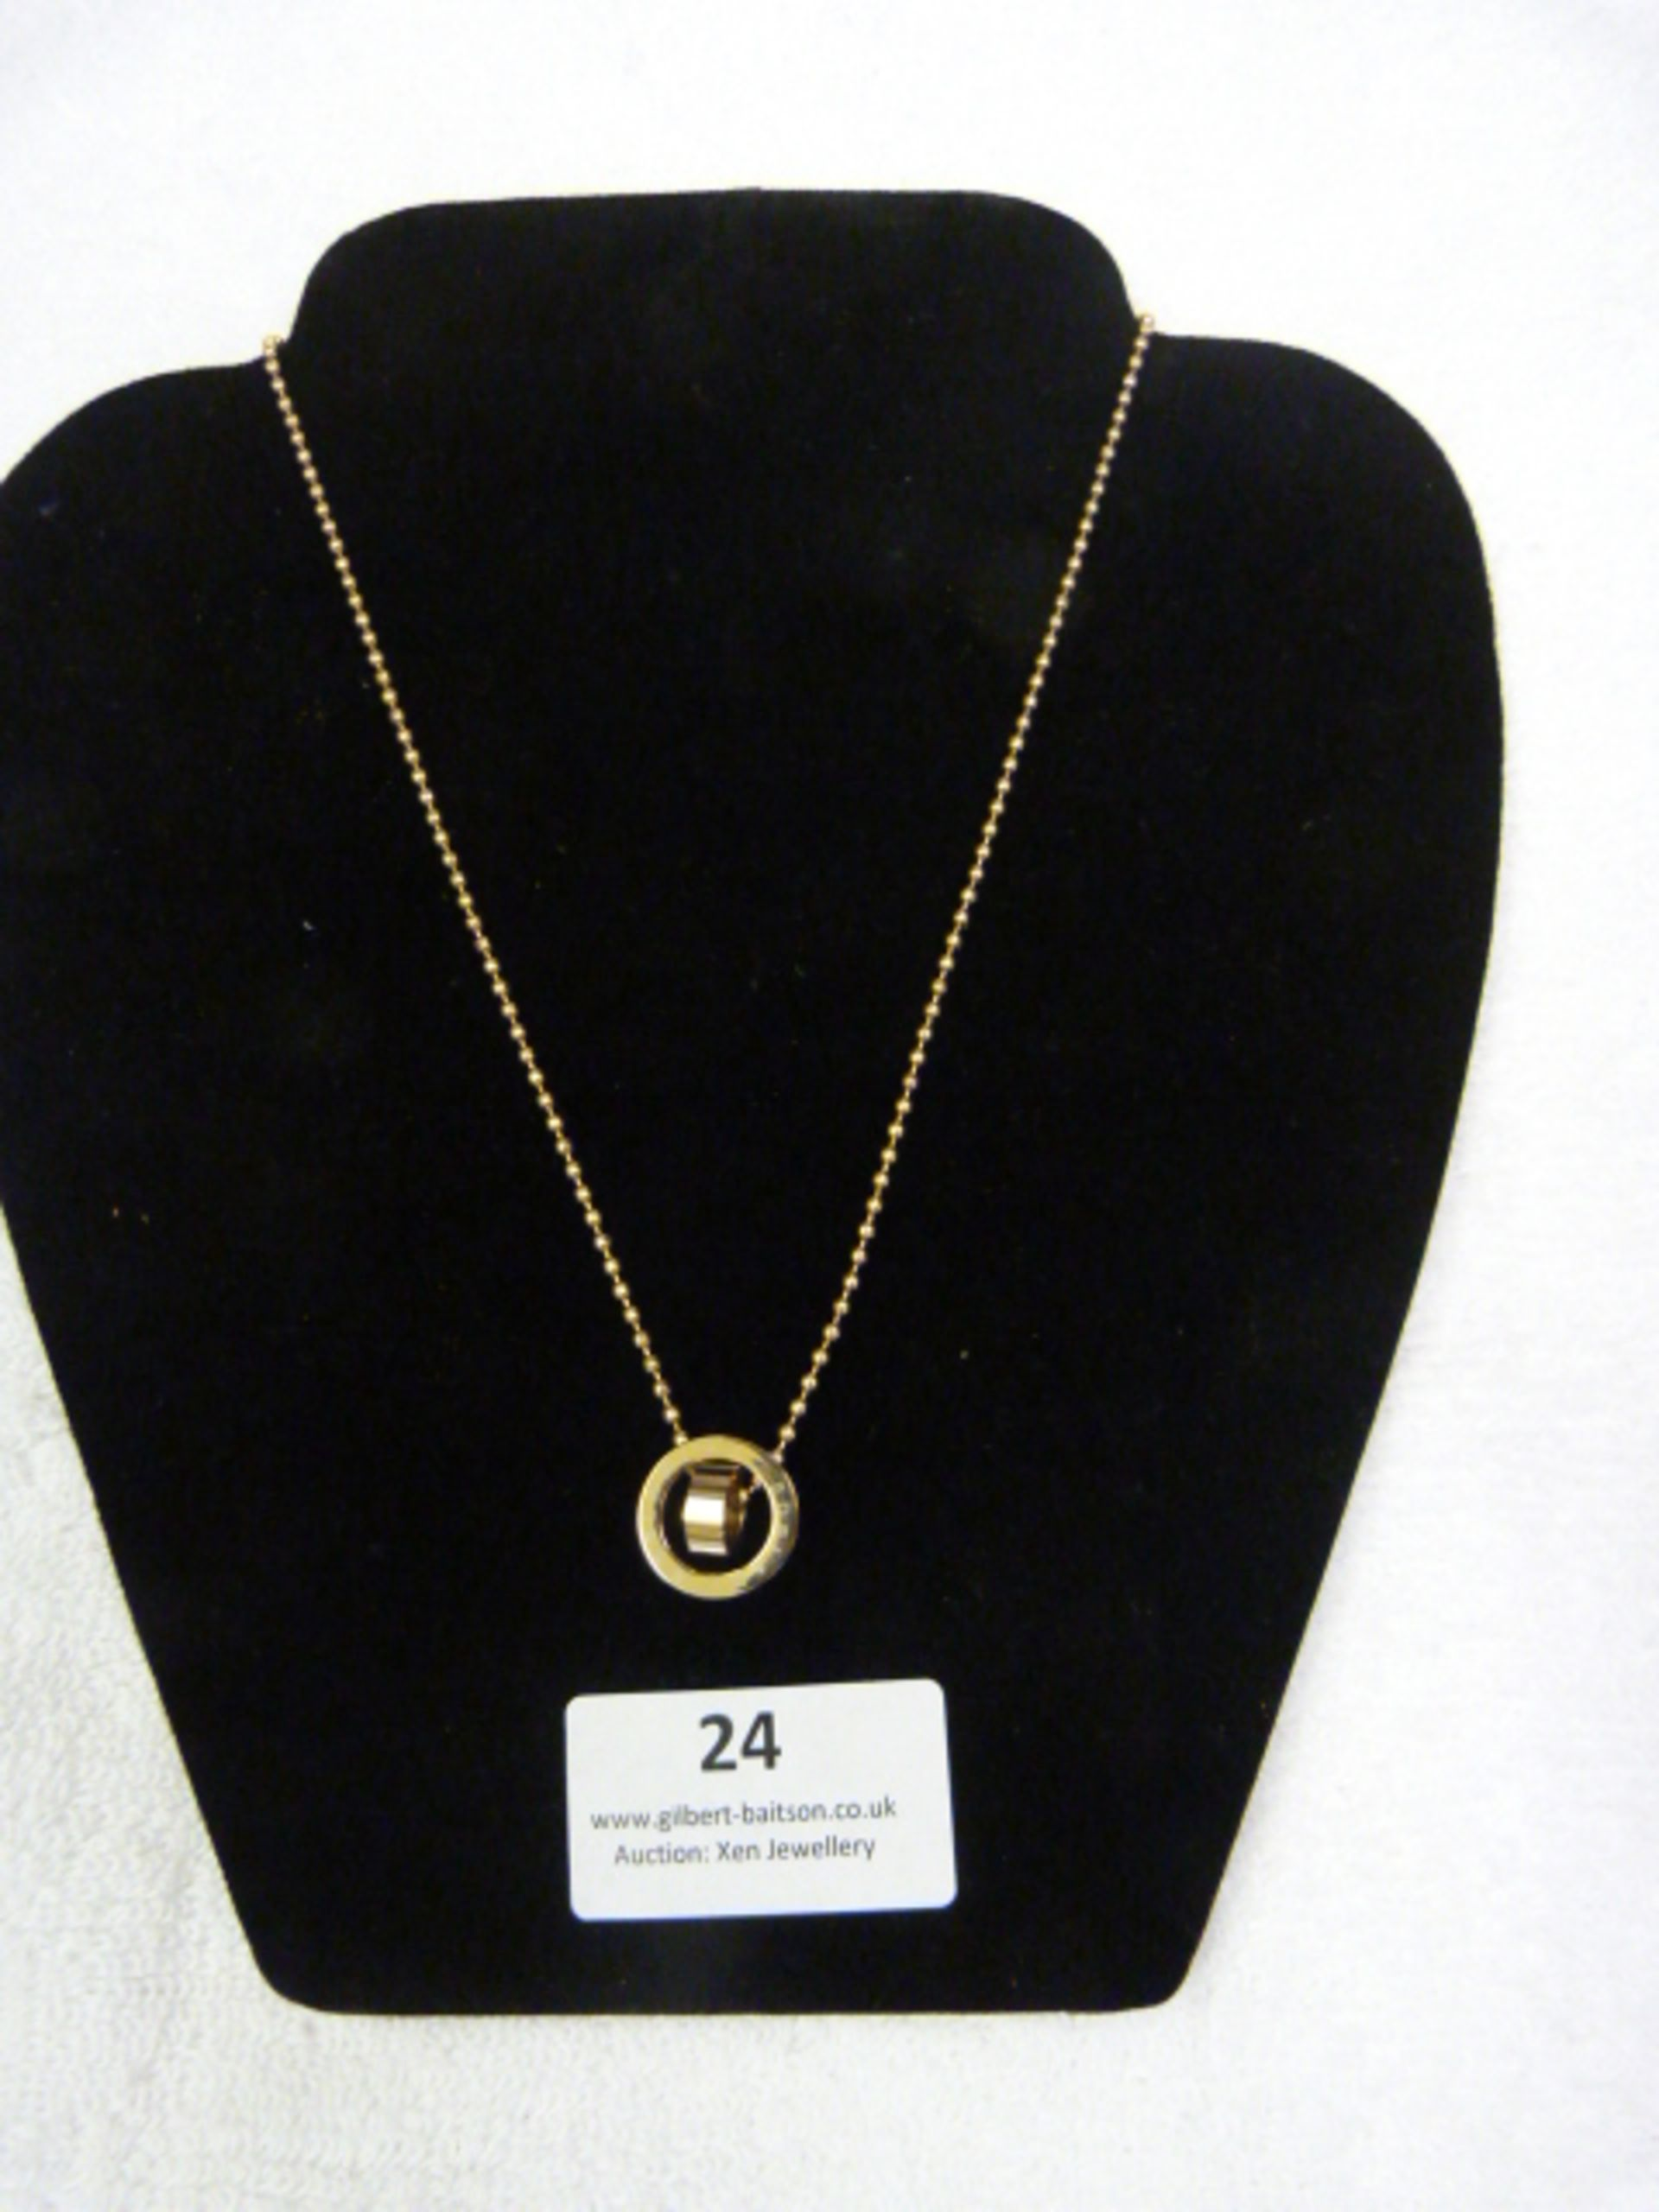 Lot 24 - *Edblad Mini Rose Gold Short Necklace